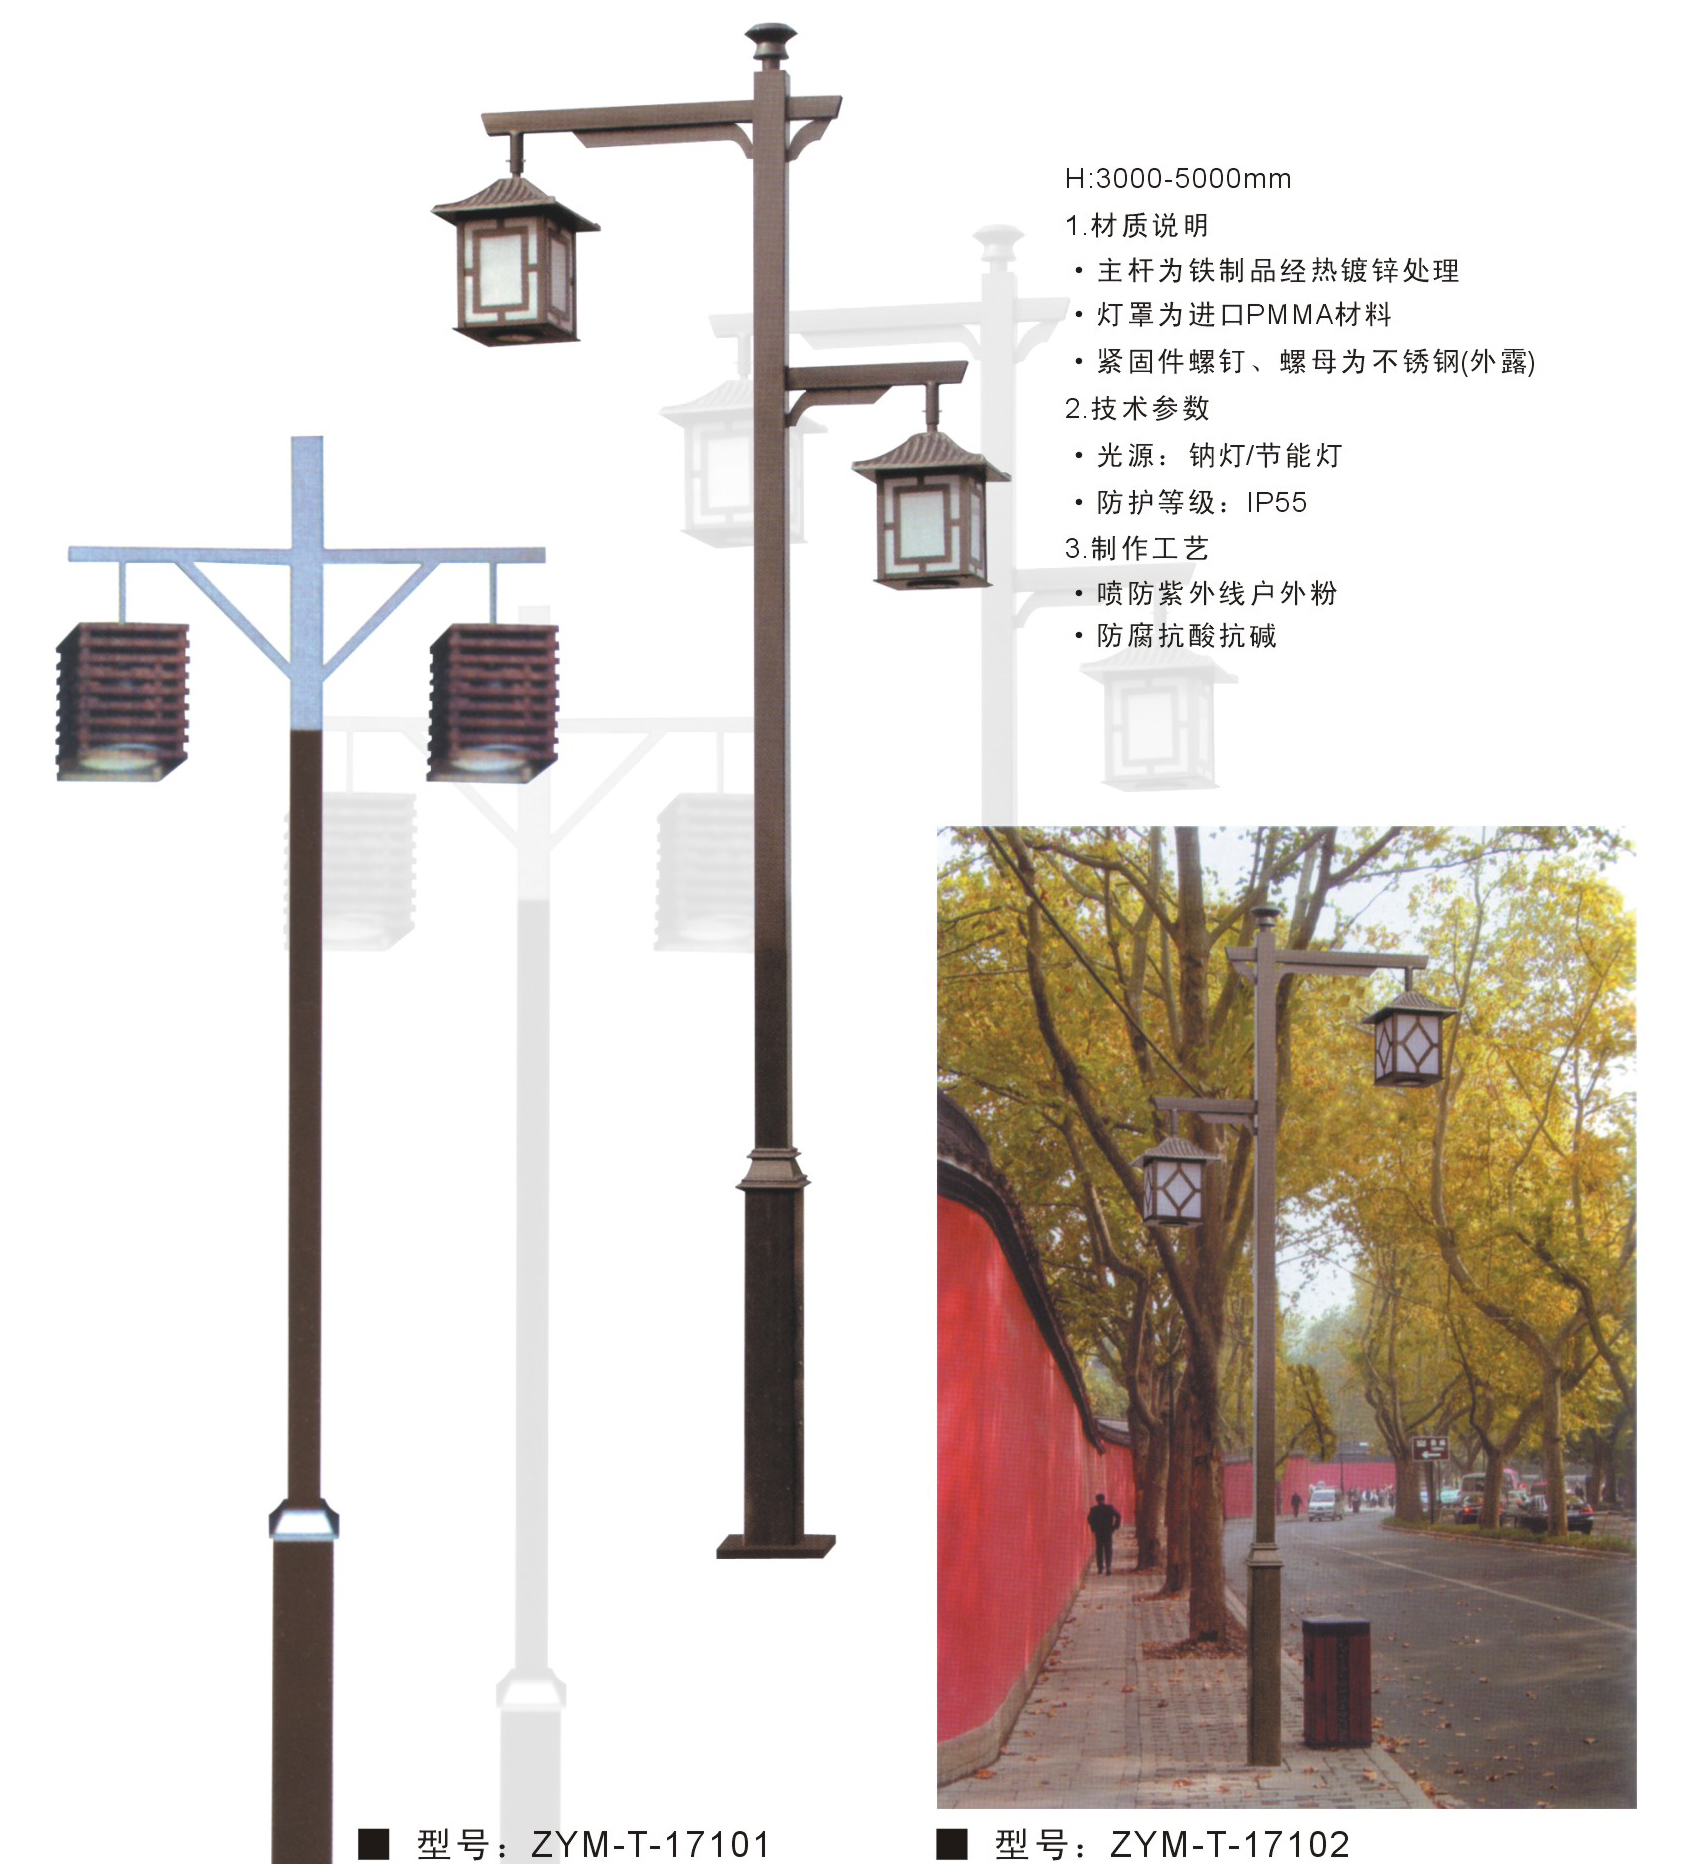 重庆路灯厂家直销 重庆路灯厂家直销供应